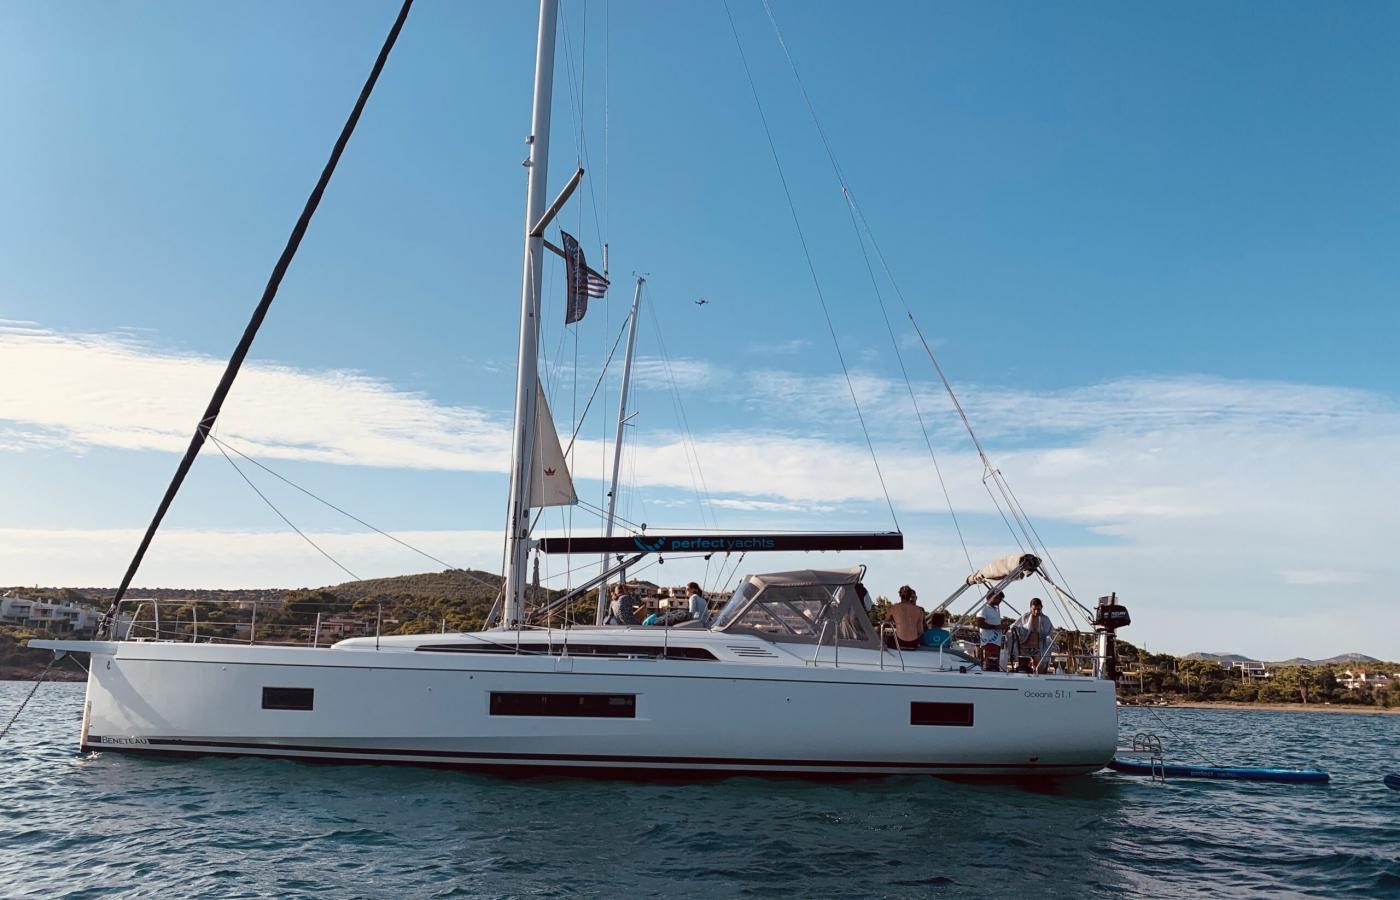 Beneteau 51.1 - Princess Oceana